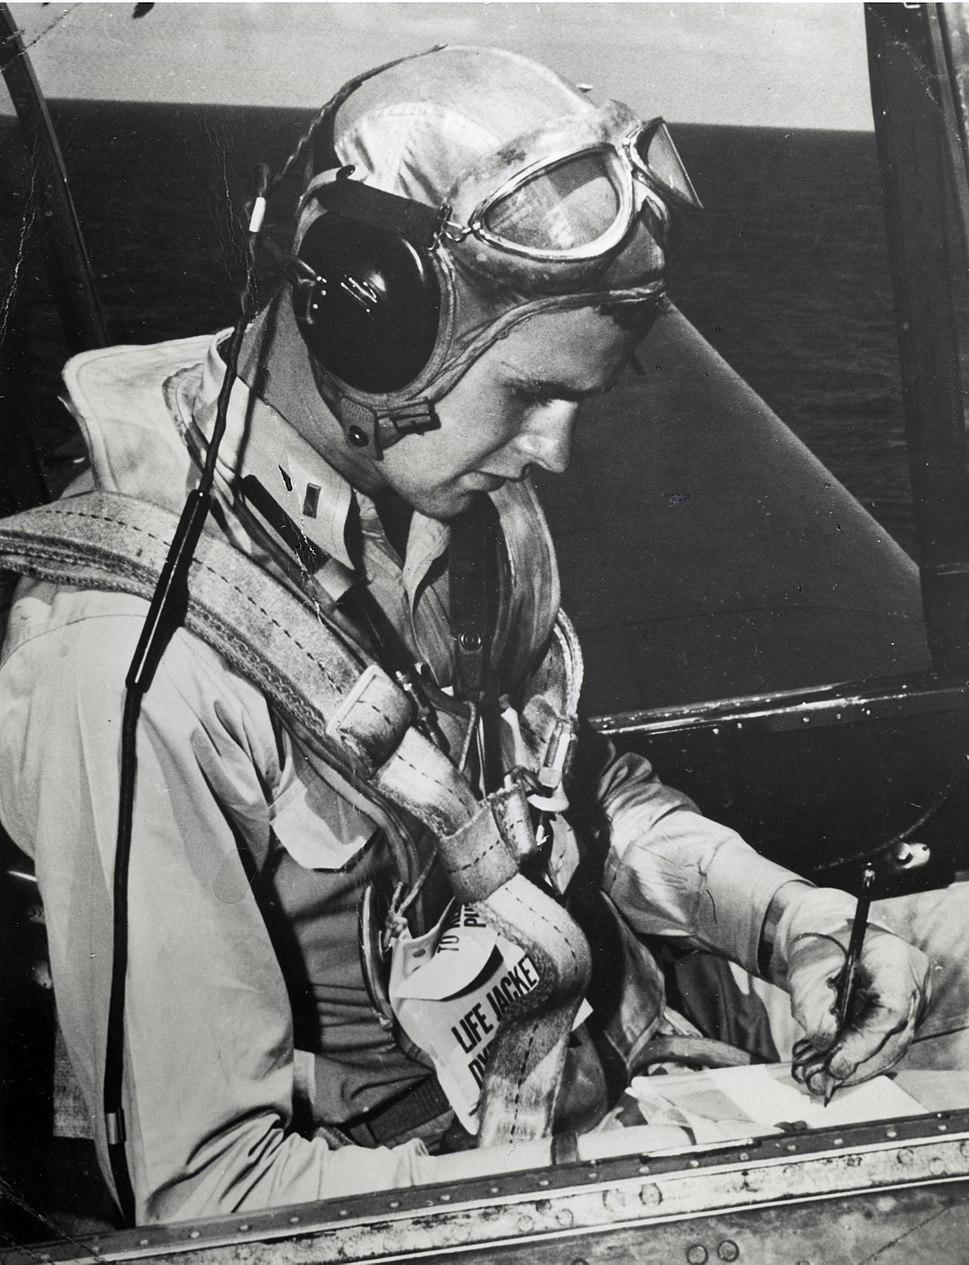 George H.W. Bush seated in a Grumman TBM Avenger, circa 1944 (H069-13)